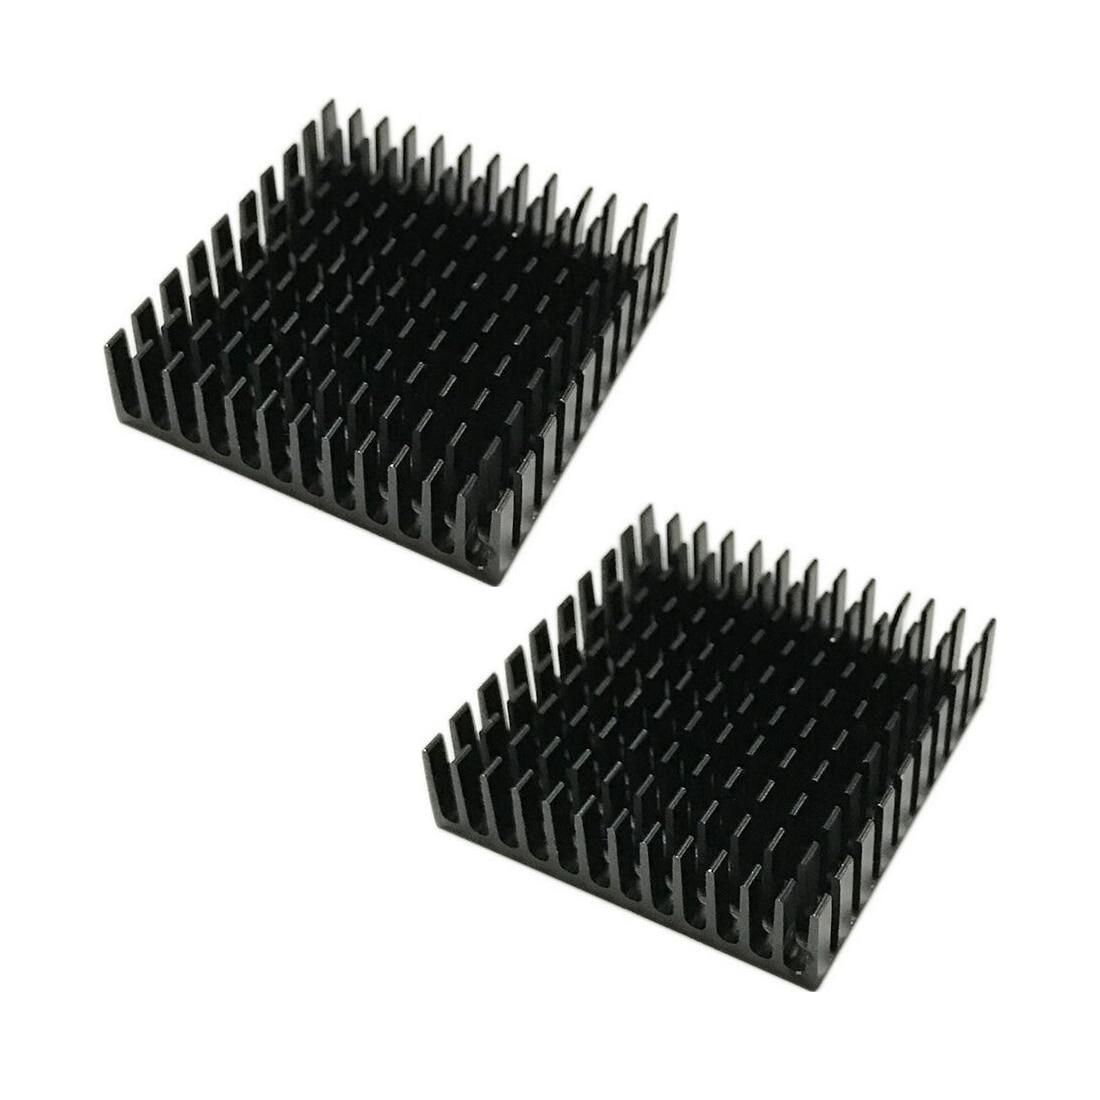 NOYOKERE Cooling  40mm*40mm*11mm DIY Cooler Aluminum Heatsink Cooling Fin Heat Sink For LED Power Memory Chip IC Black Color